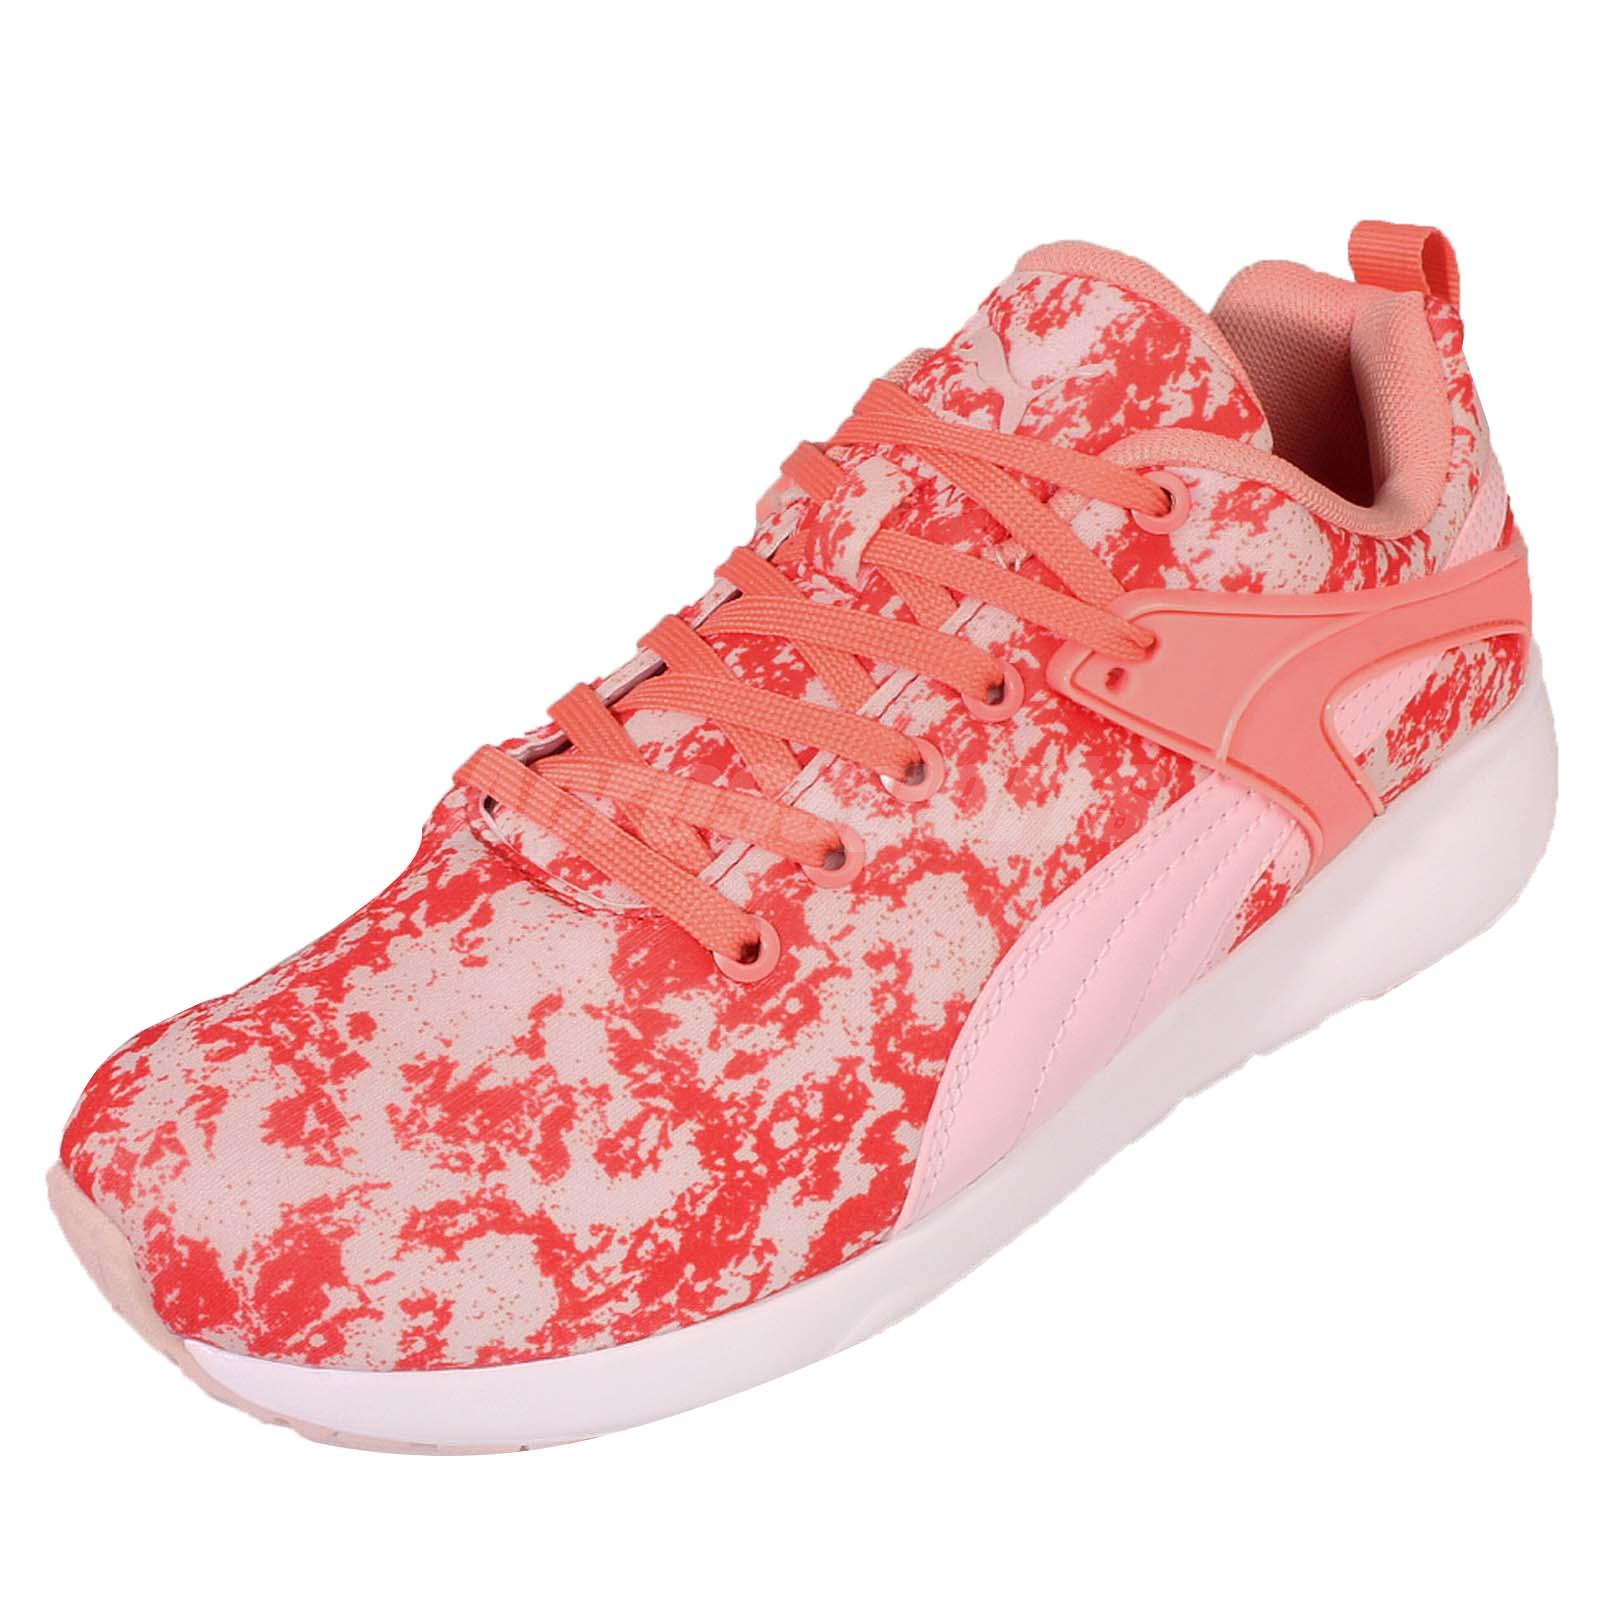 Details about Puma Aril Blaze Variation Wns Orange Pink Women Running Casual Shoes 360335 02